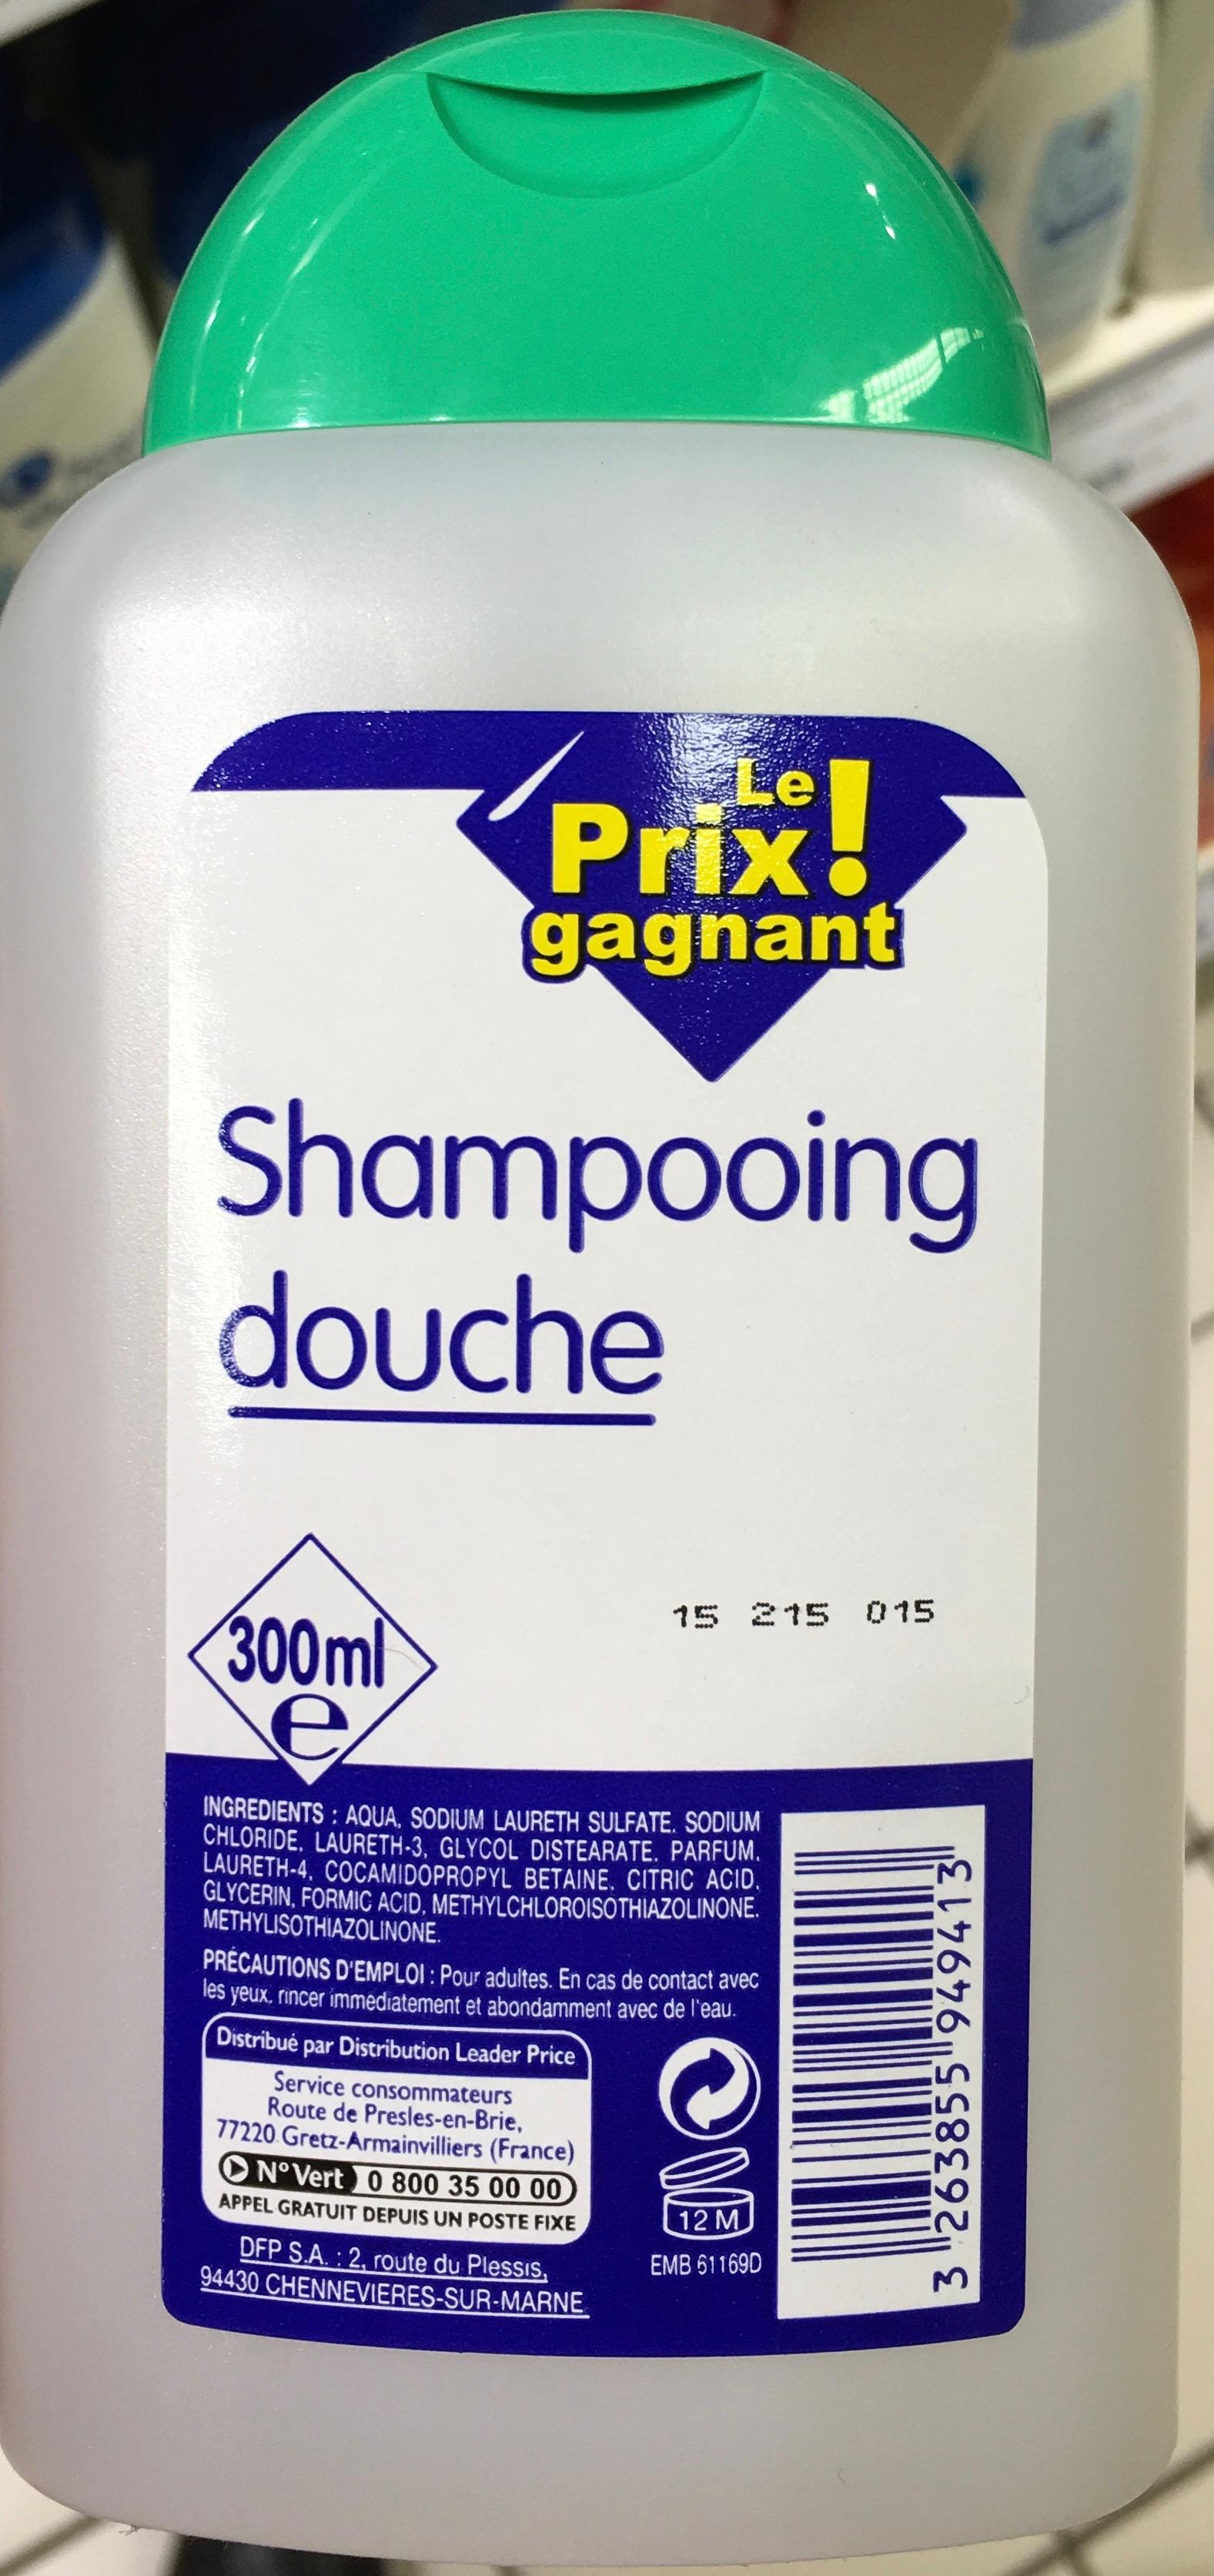 Shampooing douche - Produit - fr